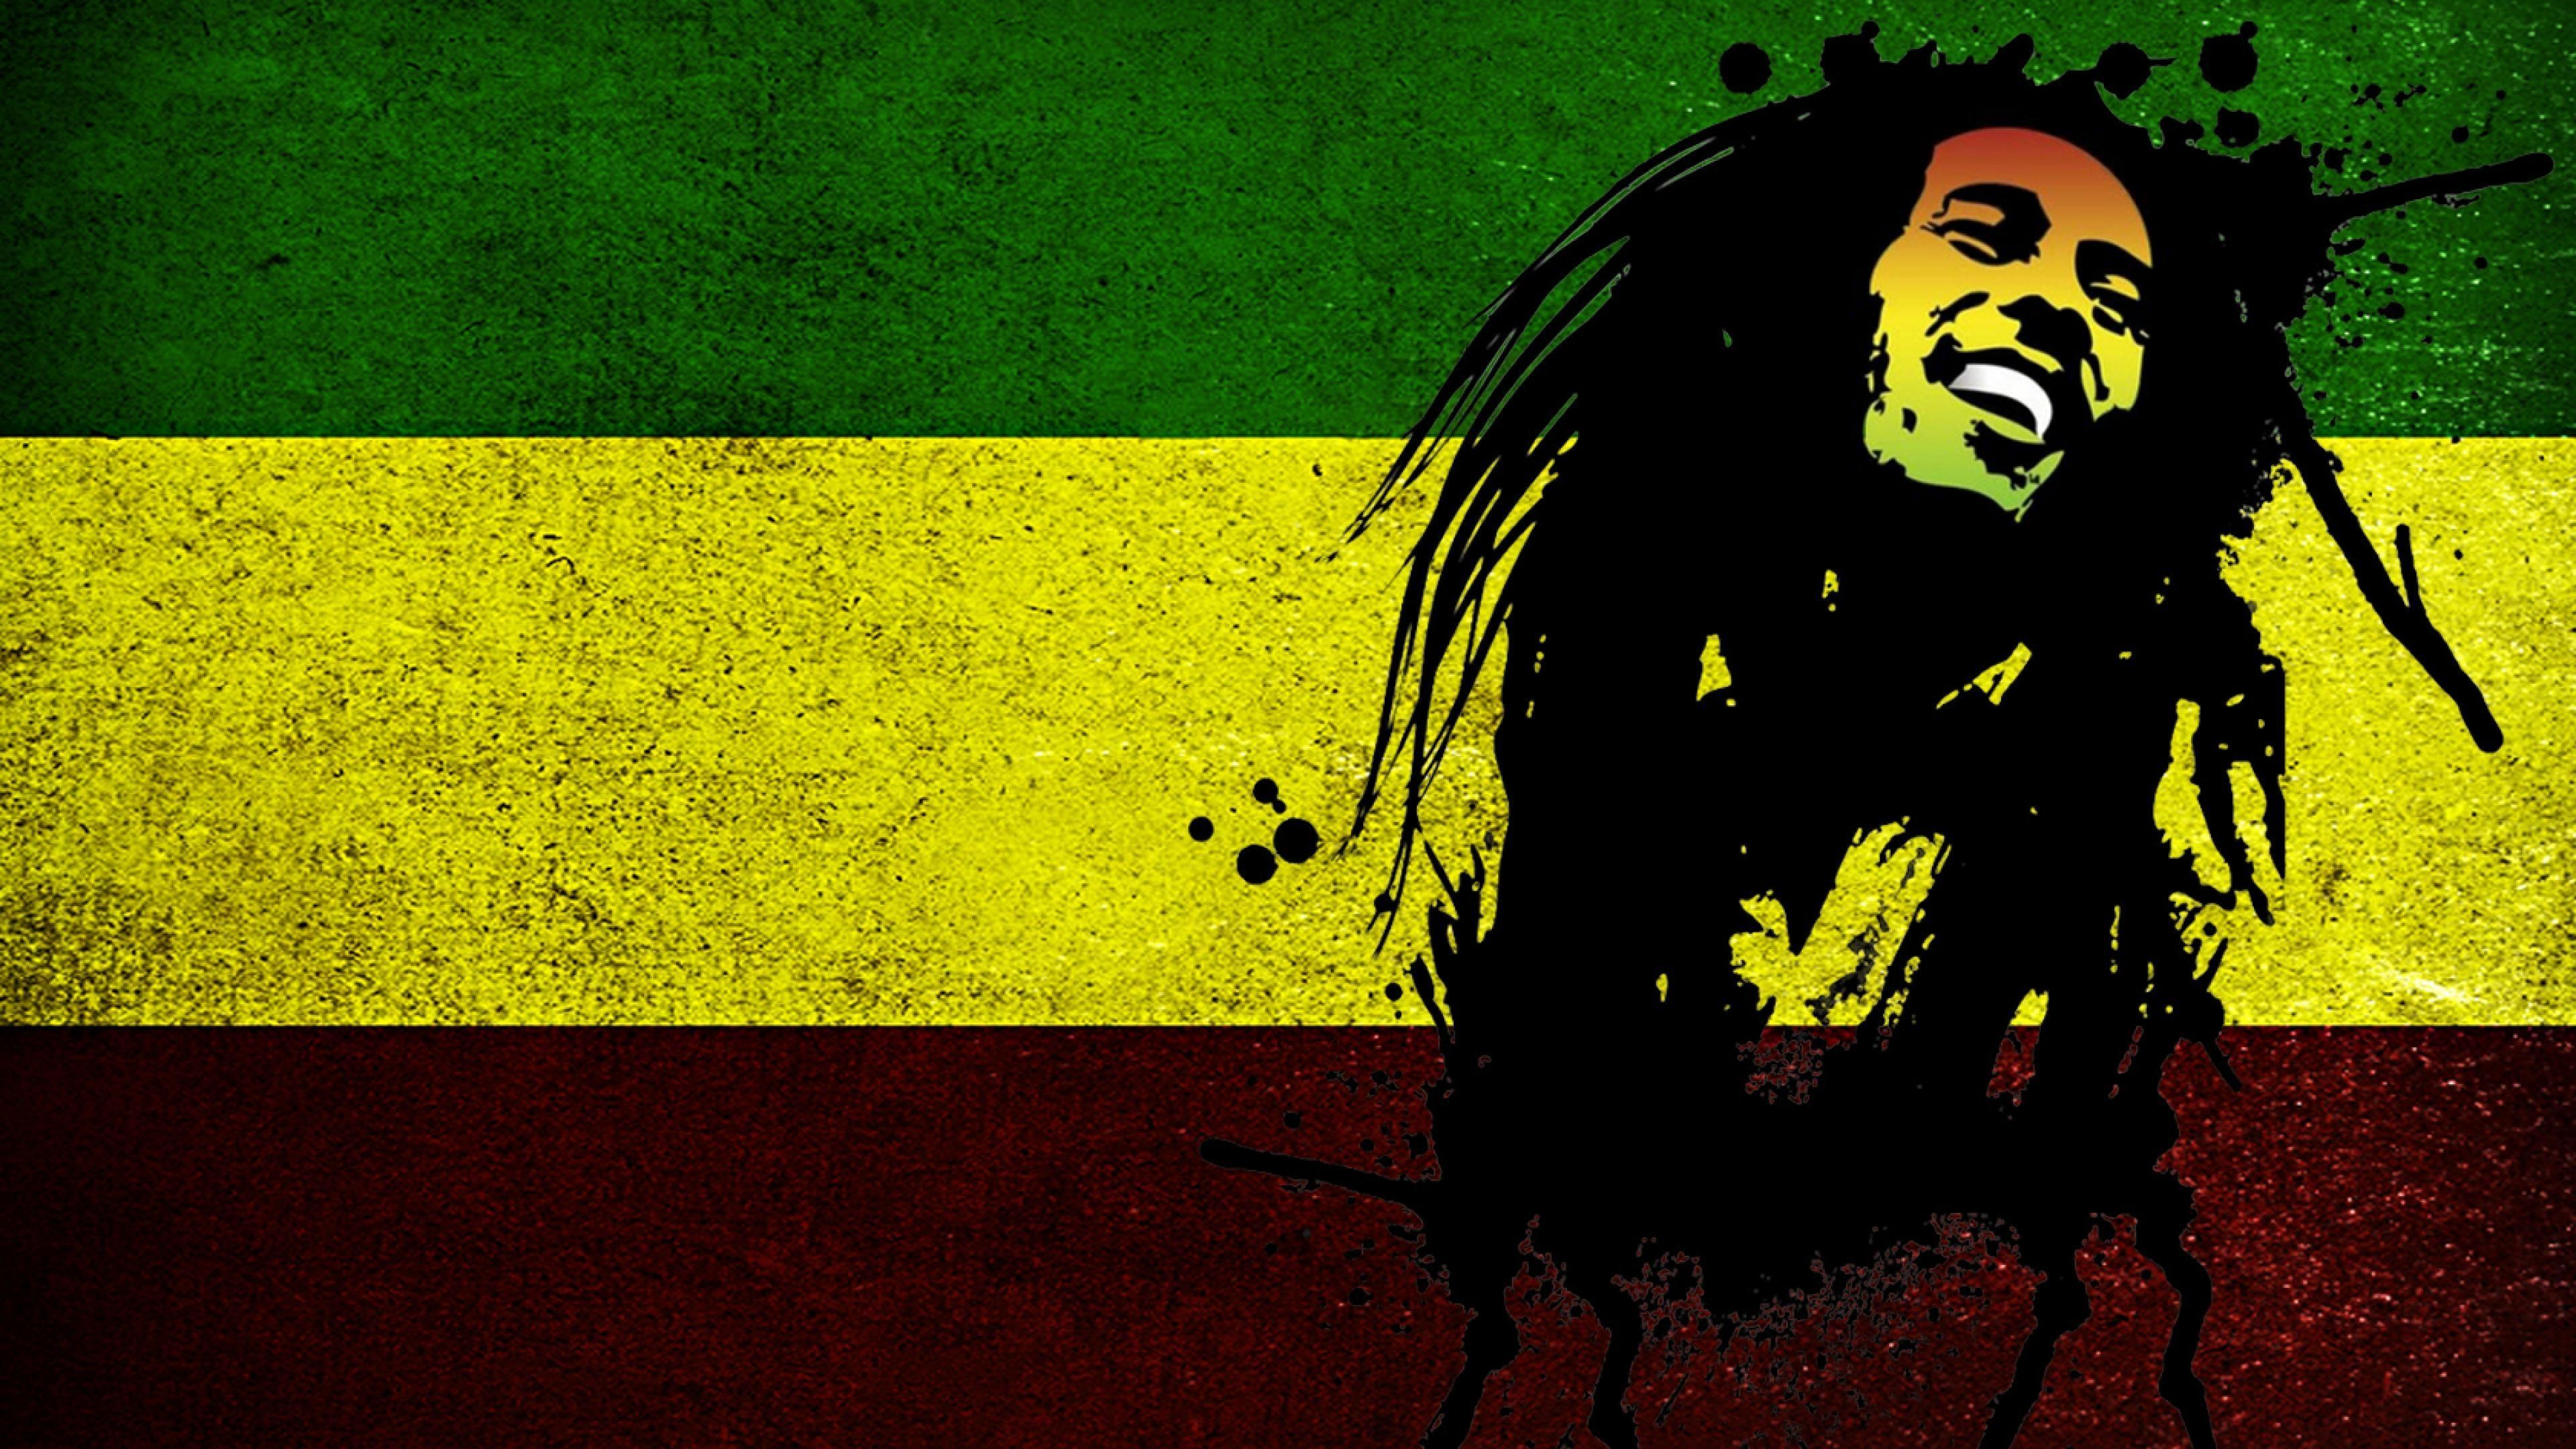 Bob Marley Wallpapers Archives - HD Desktop Wallpapers | 4k HD